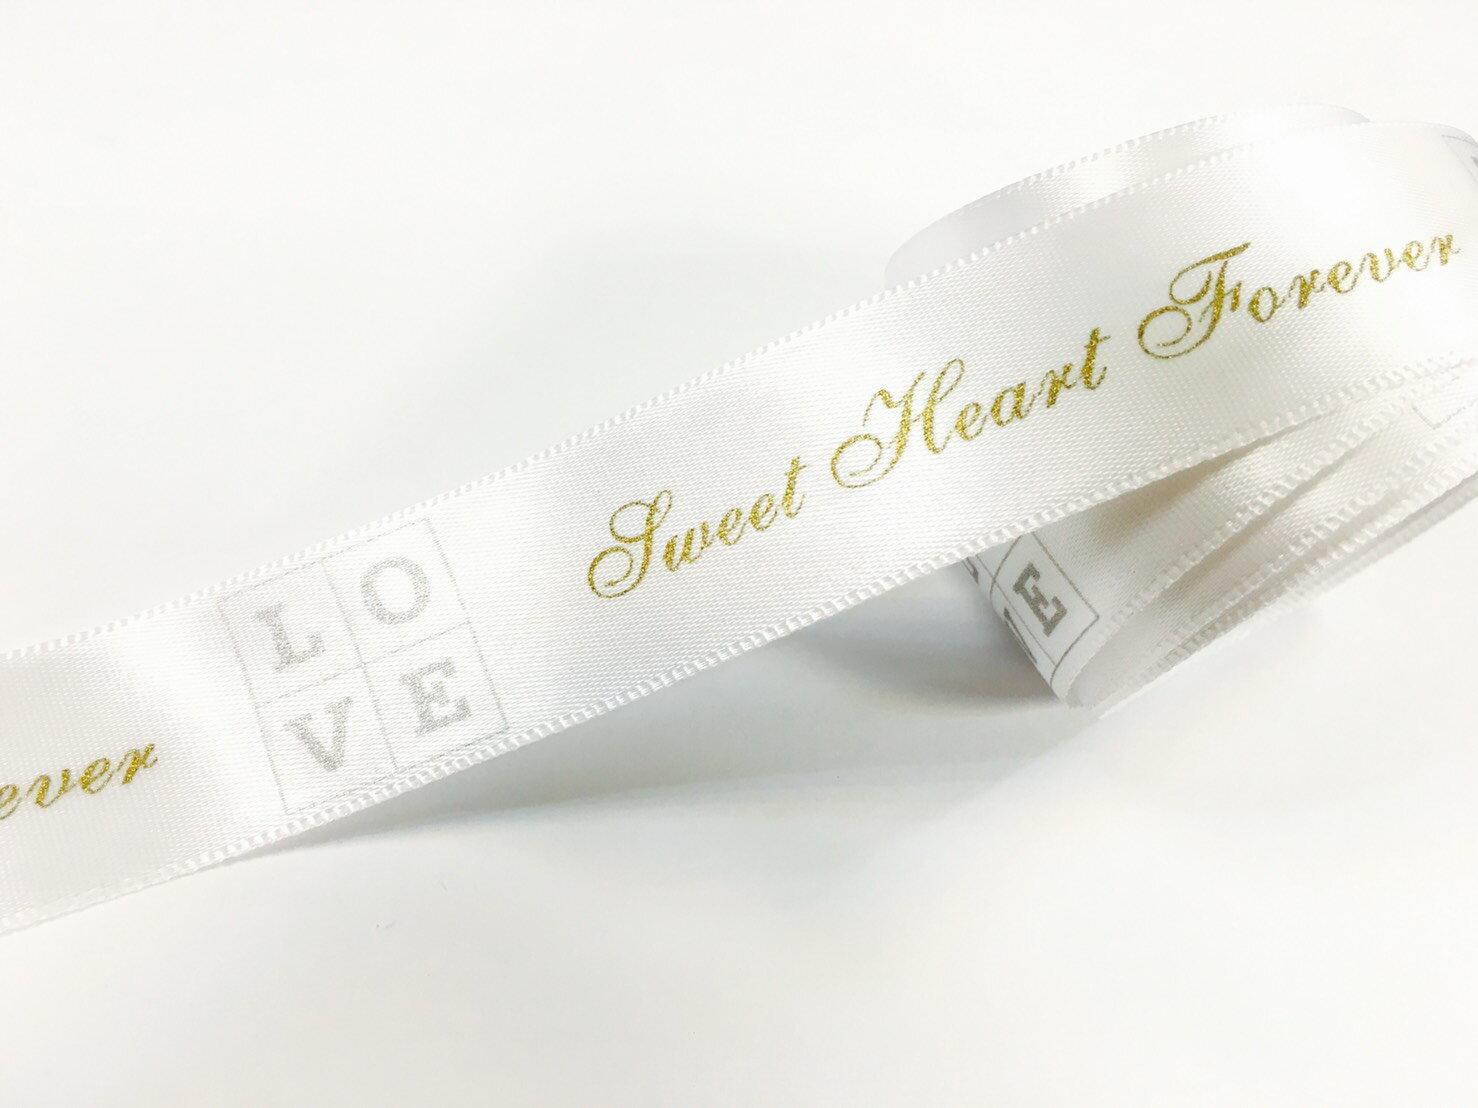 【Crystal Rose緞帶專賣店】單面緞金銀LOVE緞帶 22mm 3碼裝 - 限時優惠好康折扣